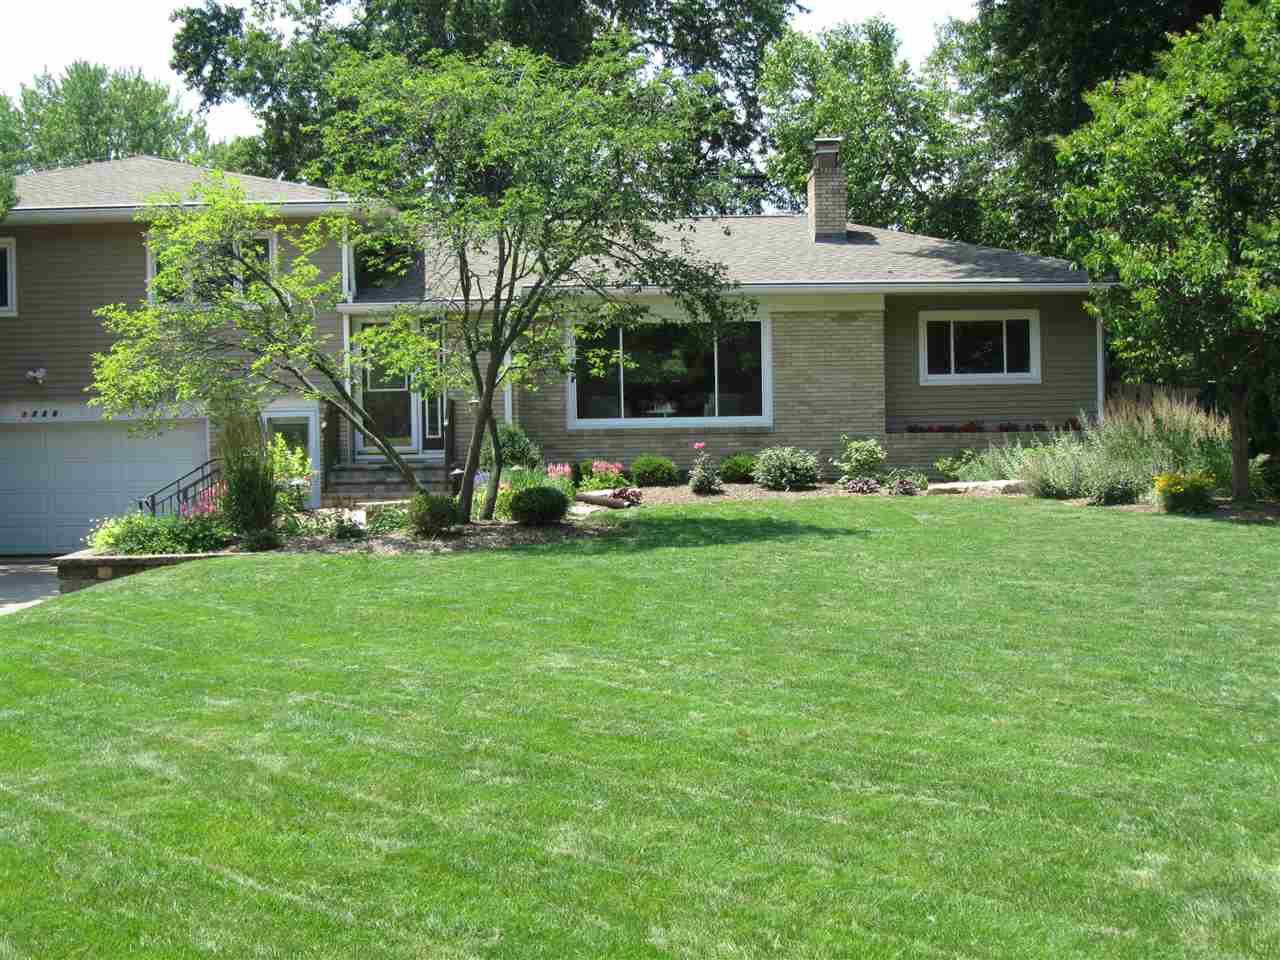 Real Estate for Sale, ListingId: 34131576, Davenport,IA52803